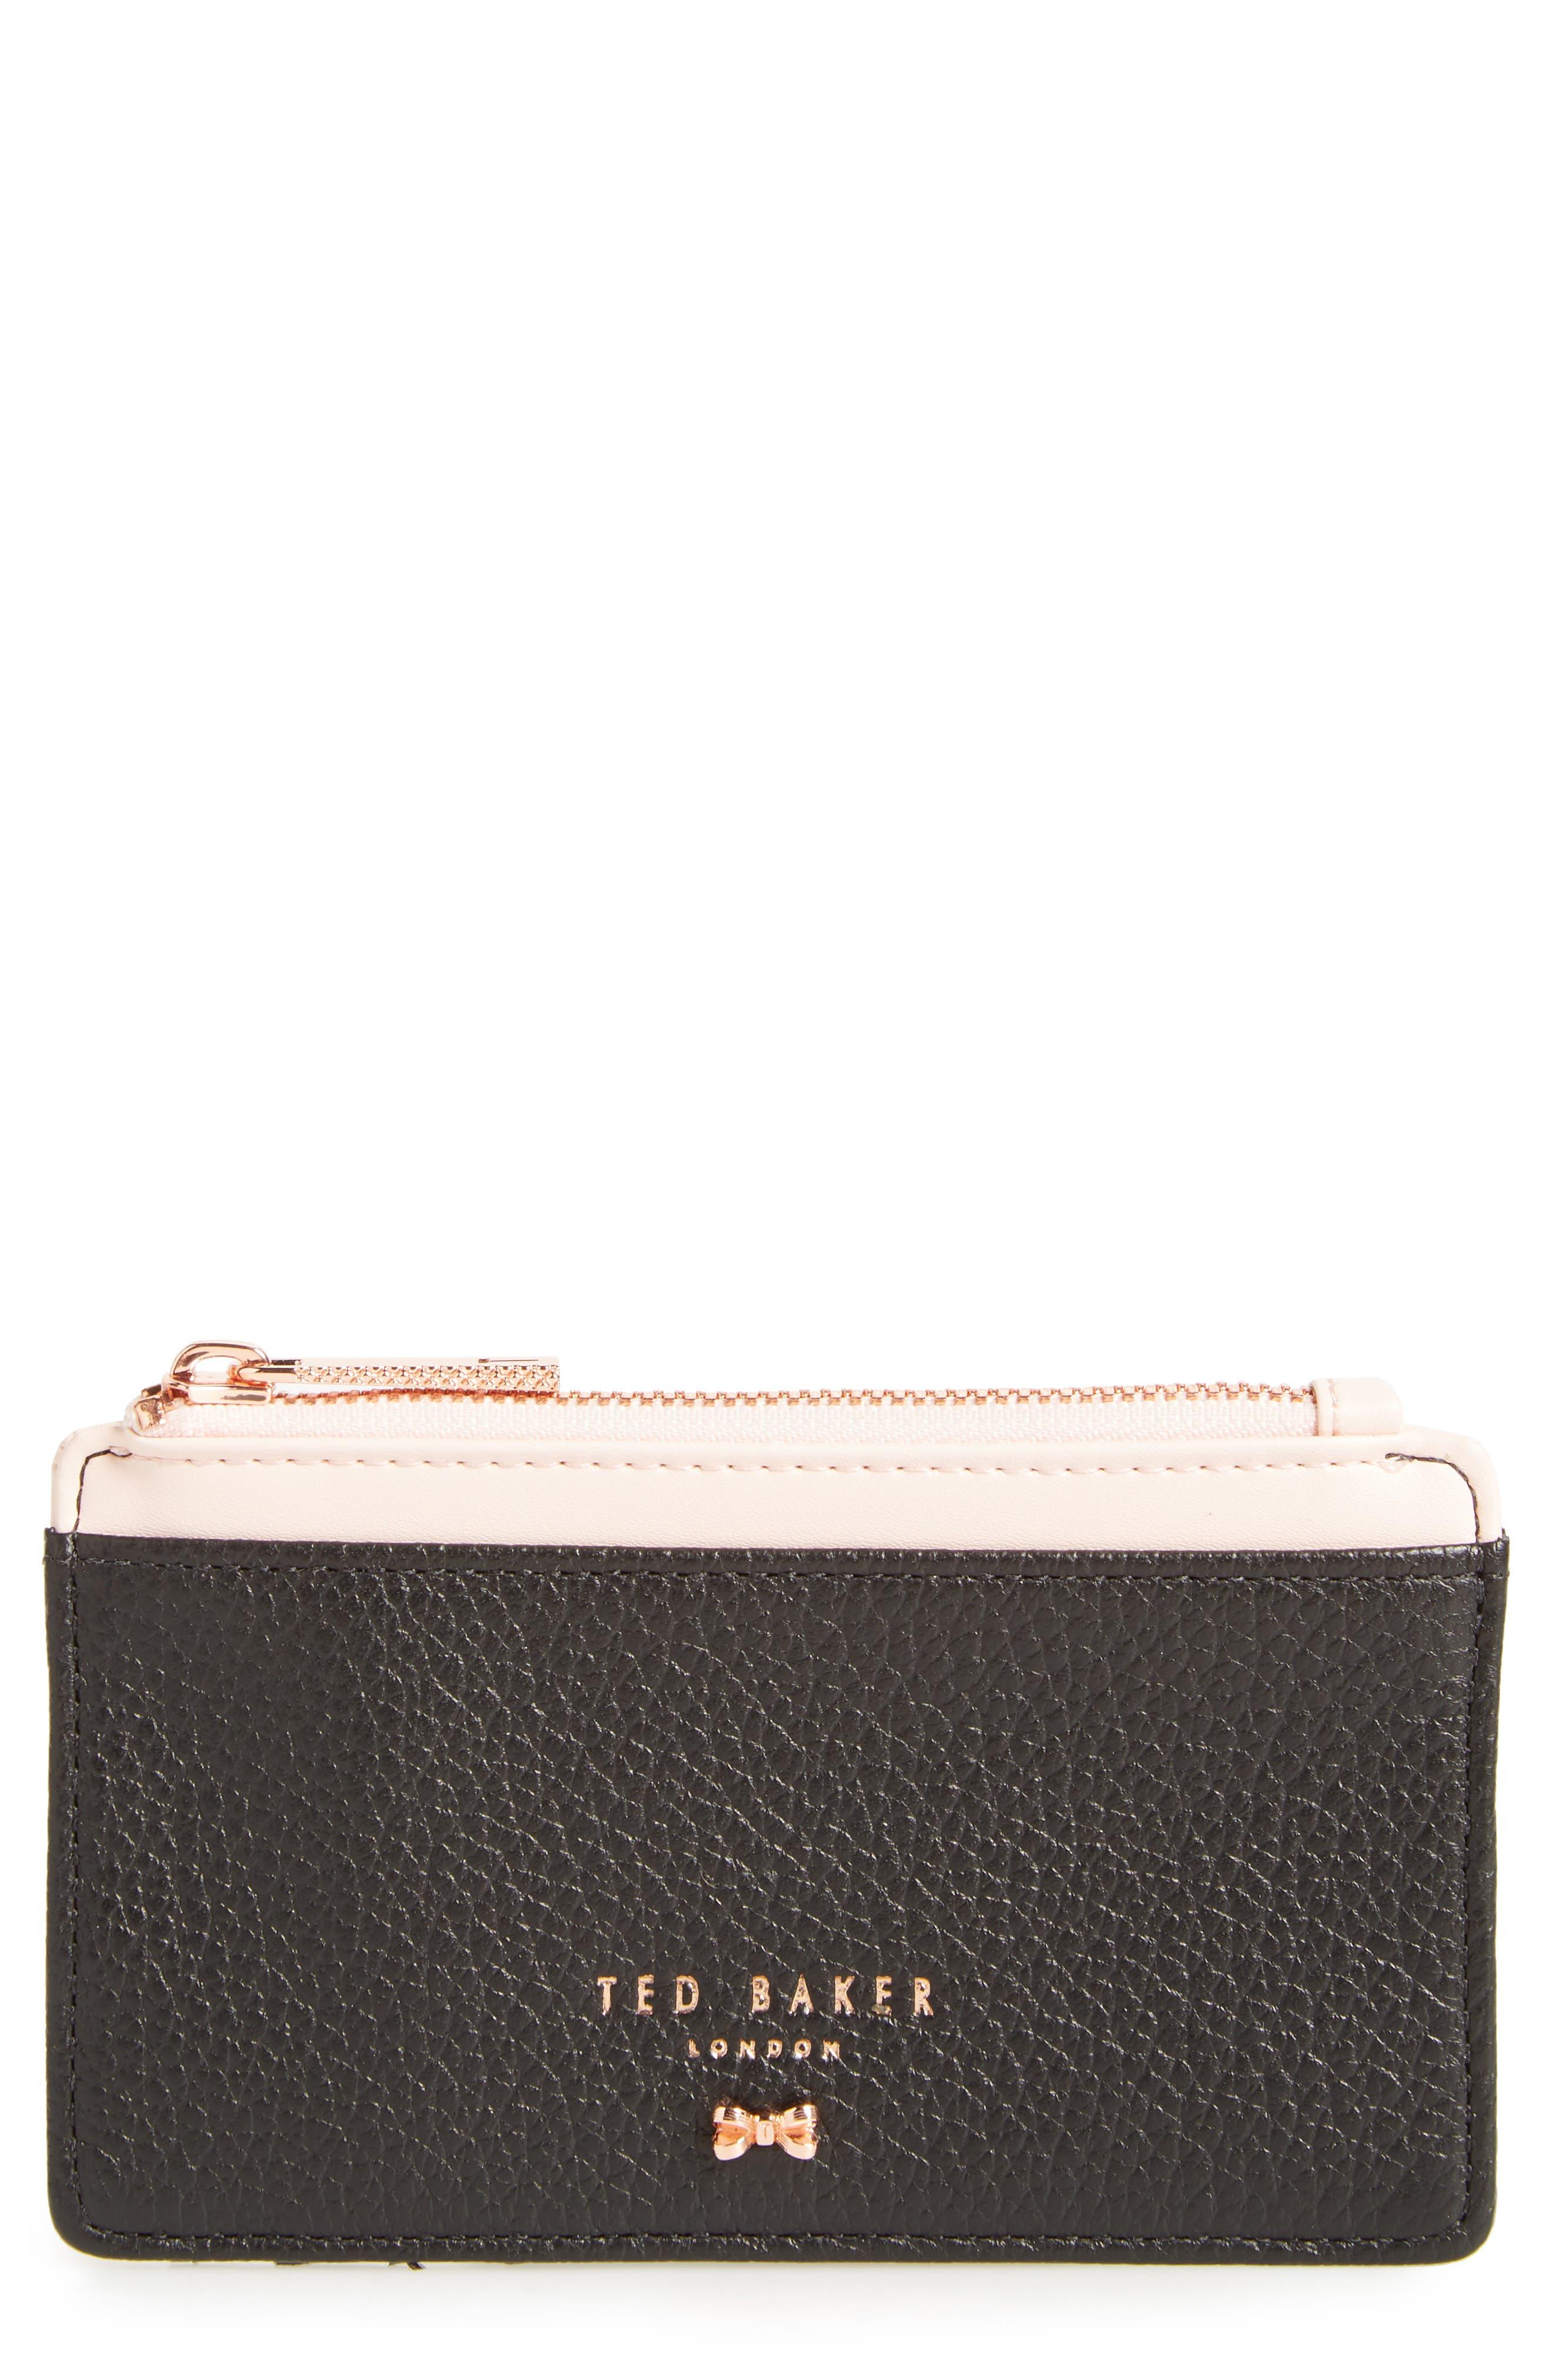 Alica Top Zip Leather Card Case,                             Main thumbnail 1, color,                             Black